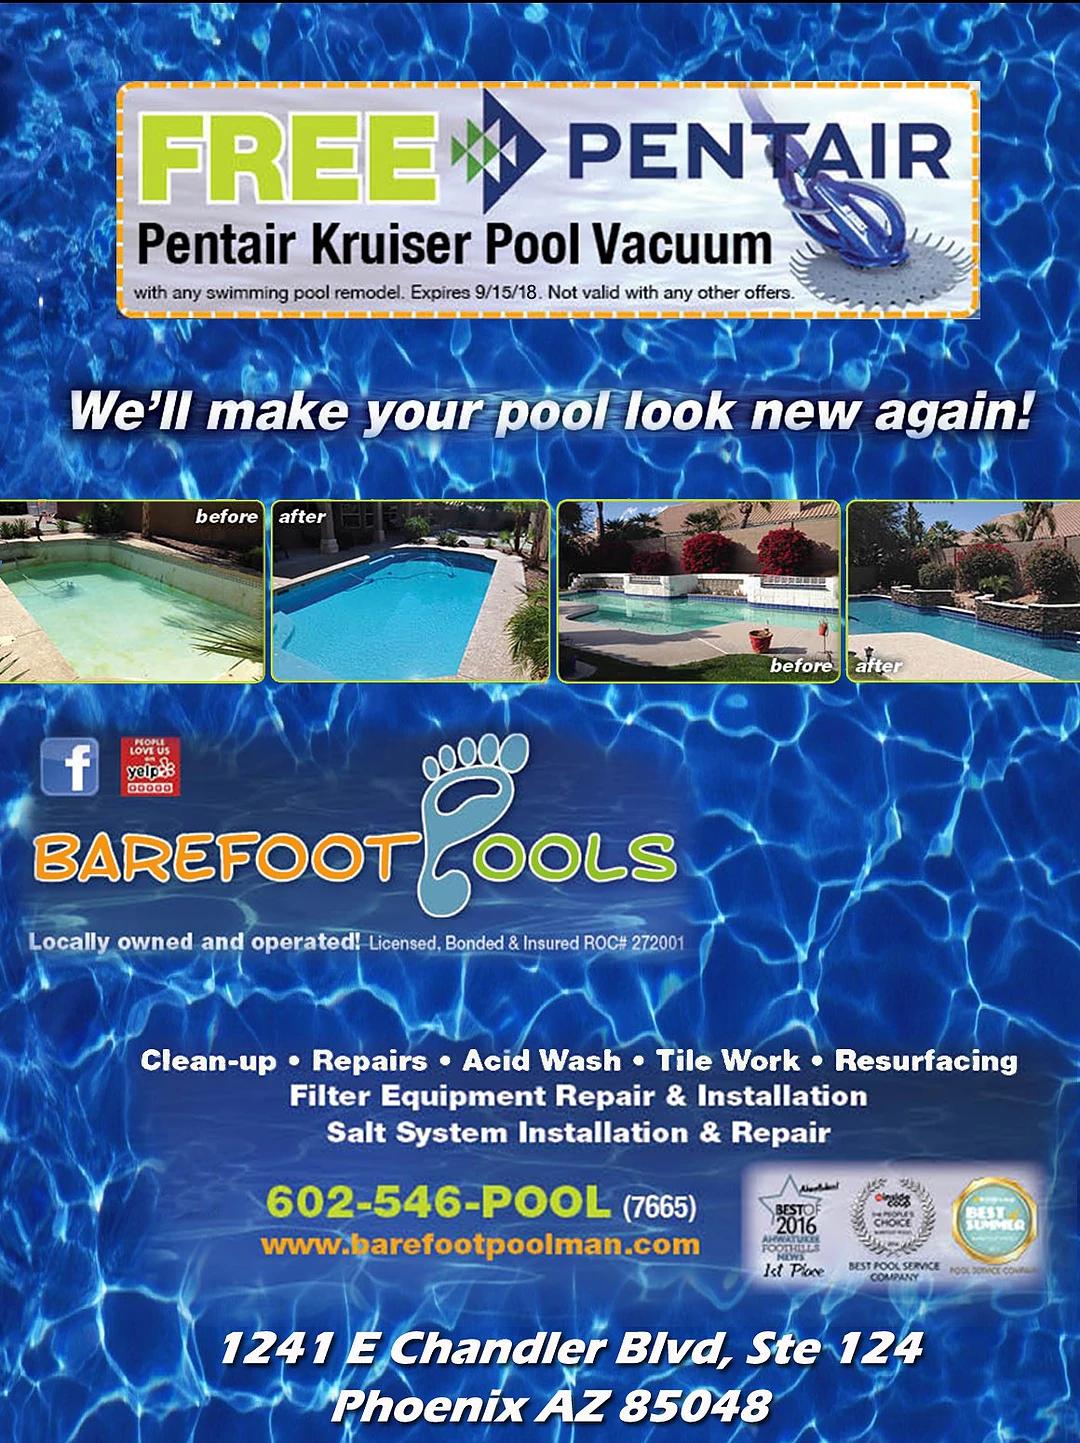 Barefoot Pools